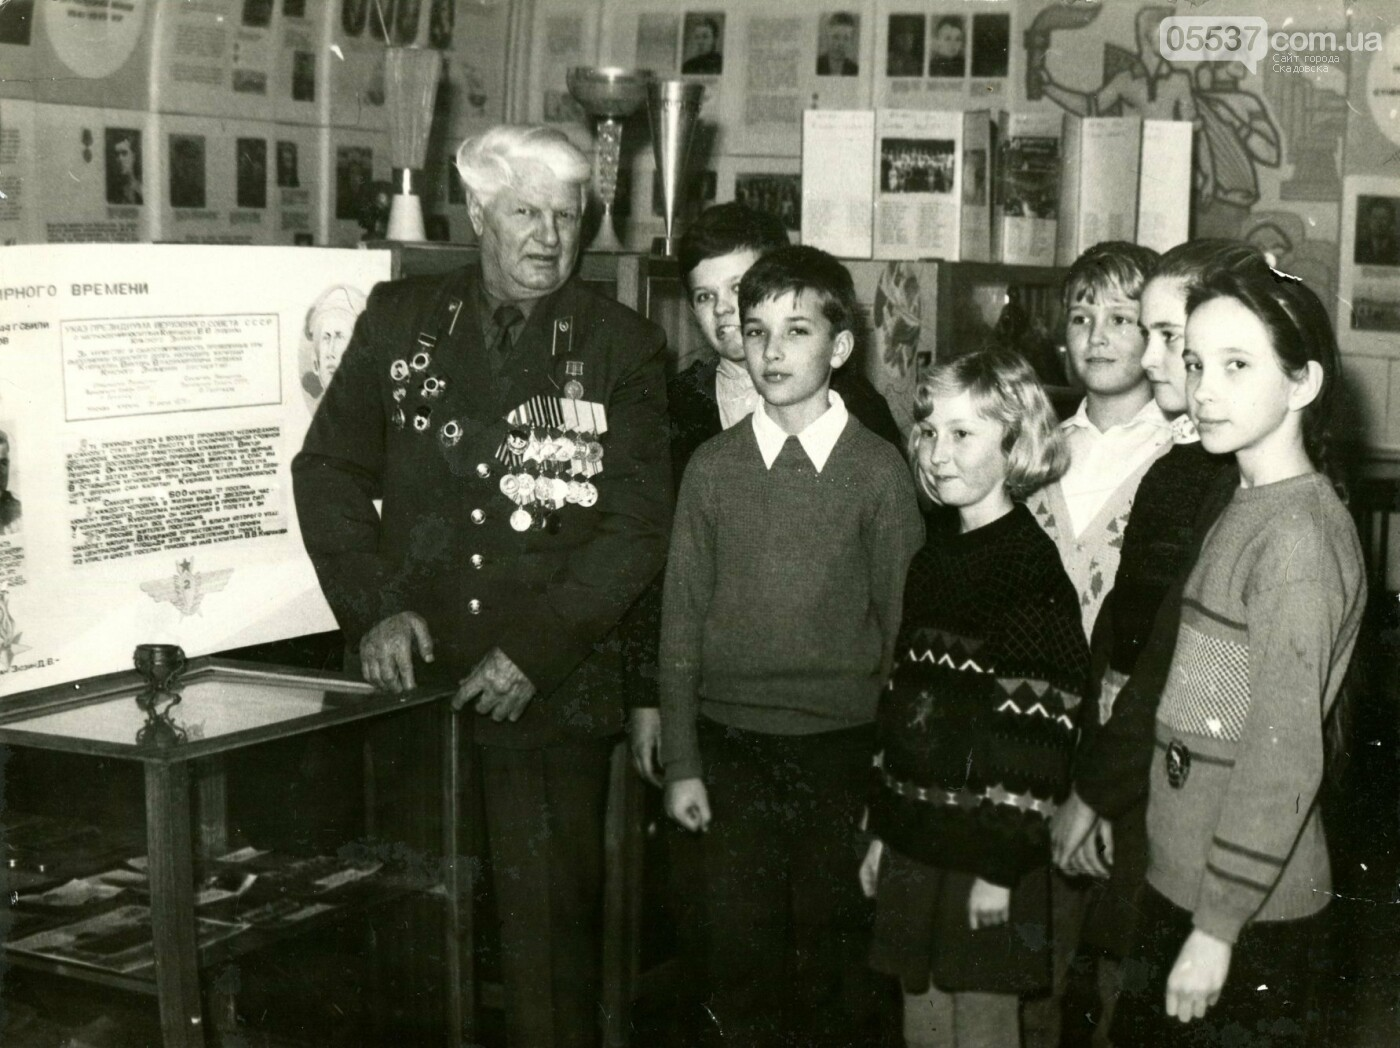 В Скадовском музее показали фото тех, кто освобождал город от нацистов, фото-5